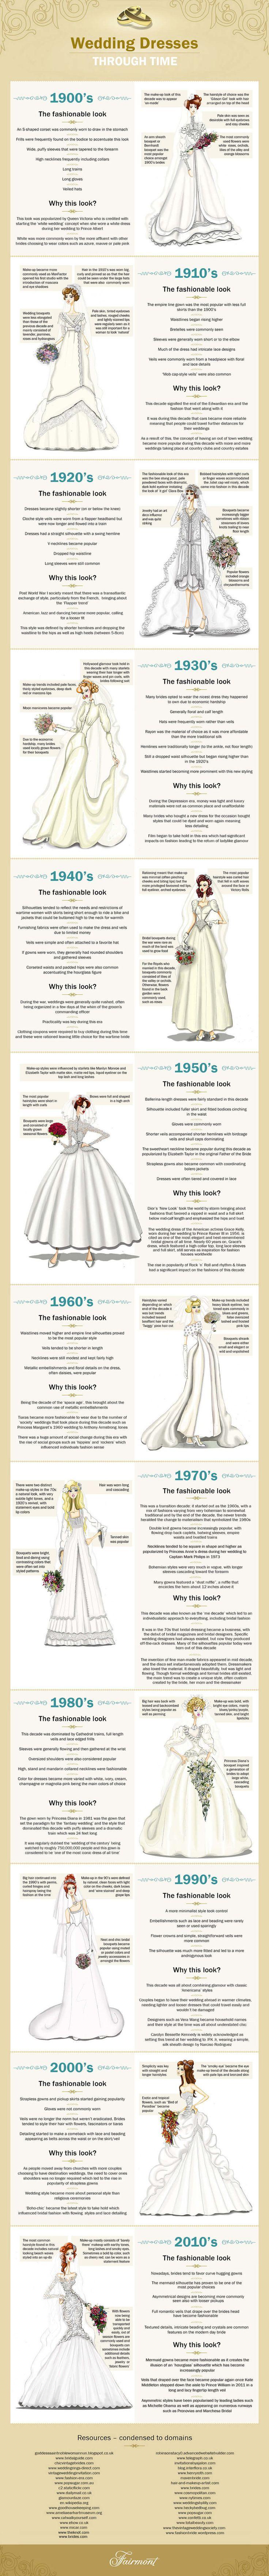 best wedding dresses images on pinterest groom attire